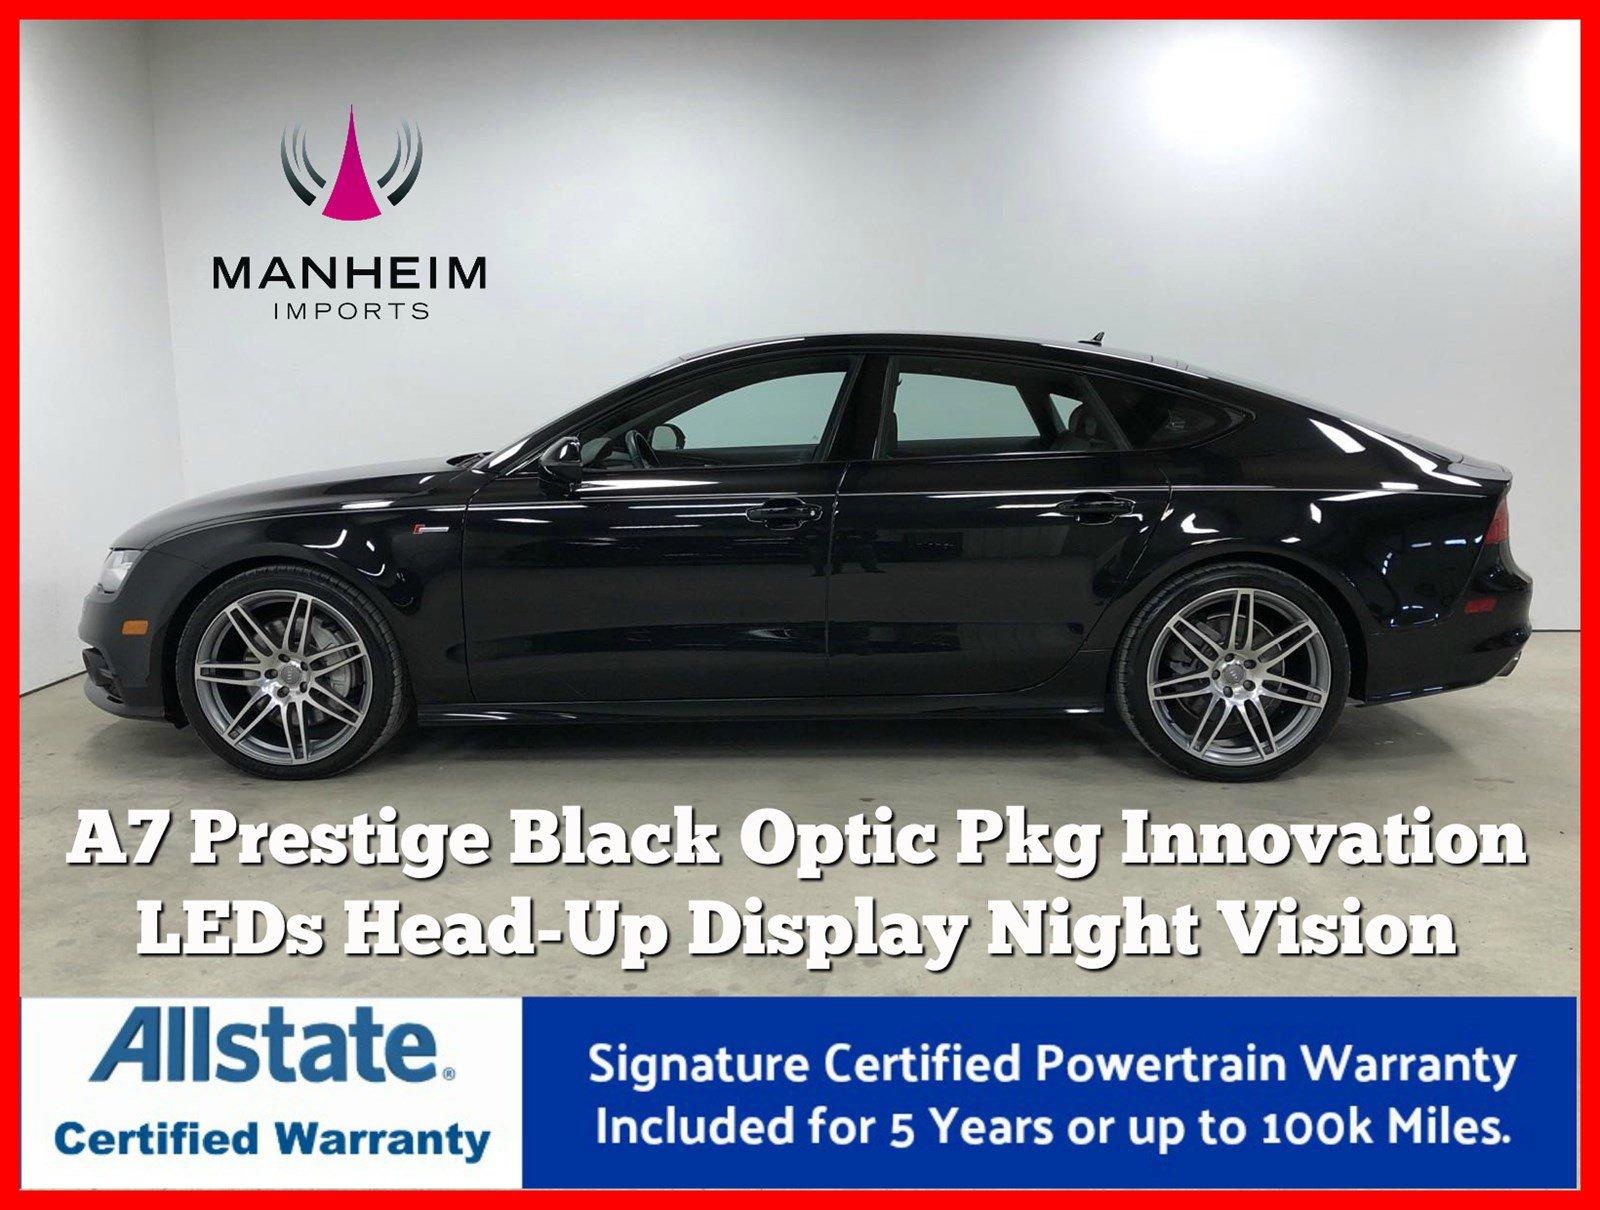 Pre-Owned 2014 Audi A7 3.0 Prestige Black Optic Package